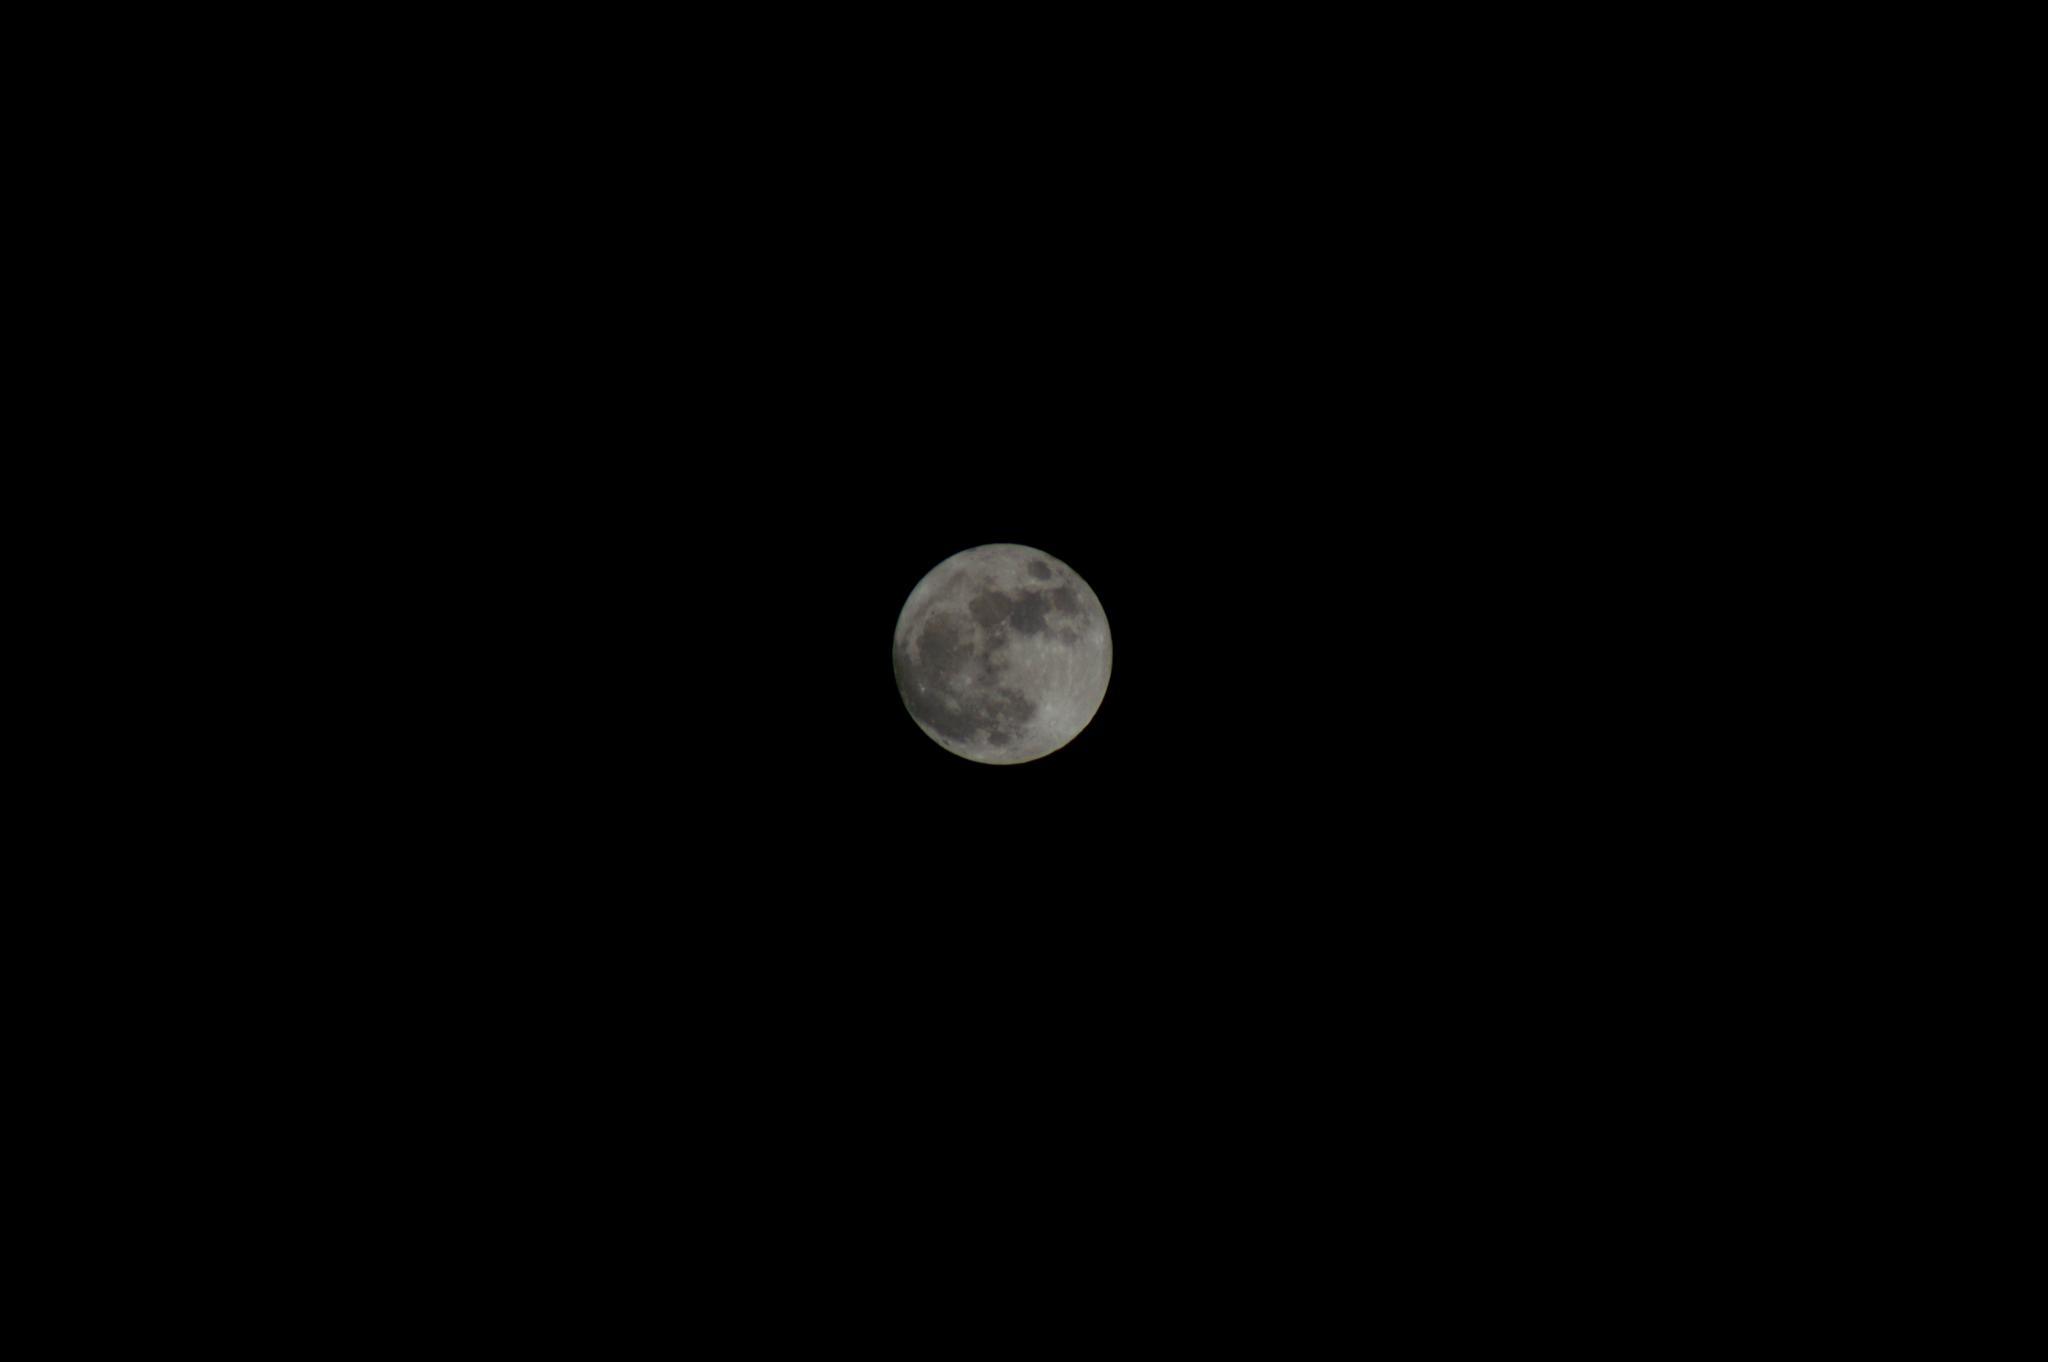 Moon by Richard Nagy